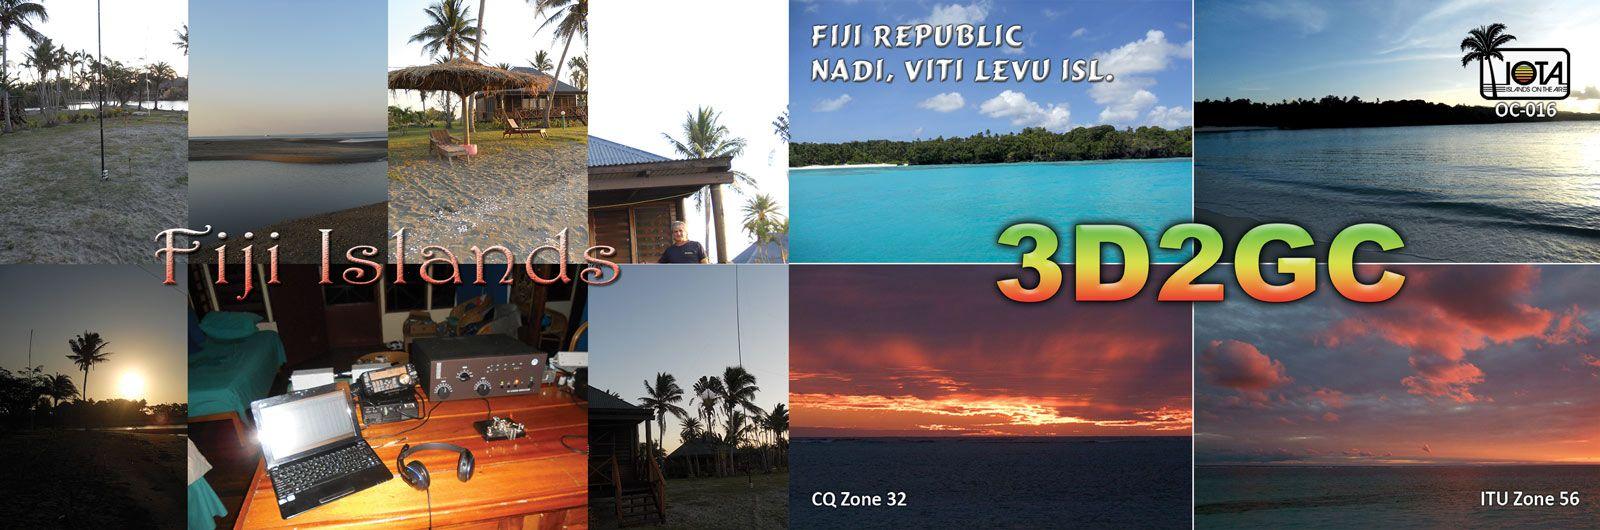 Остров Вити Леву 3D2GC острова Фиджи QSL